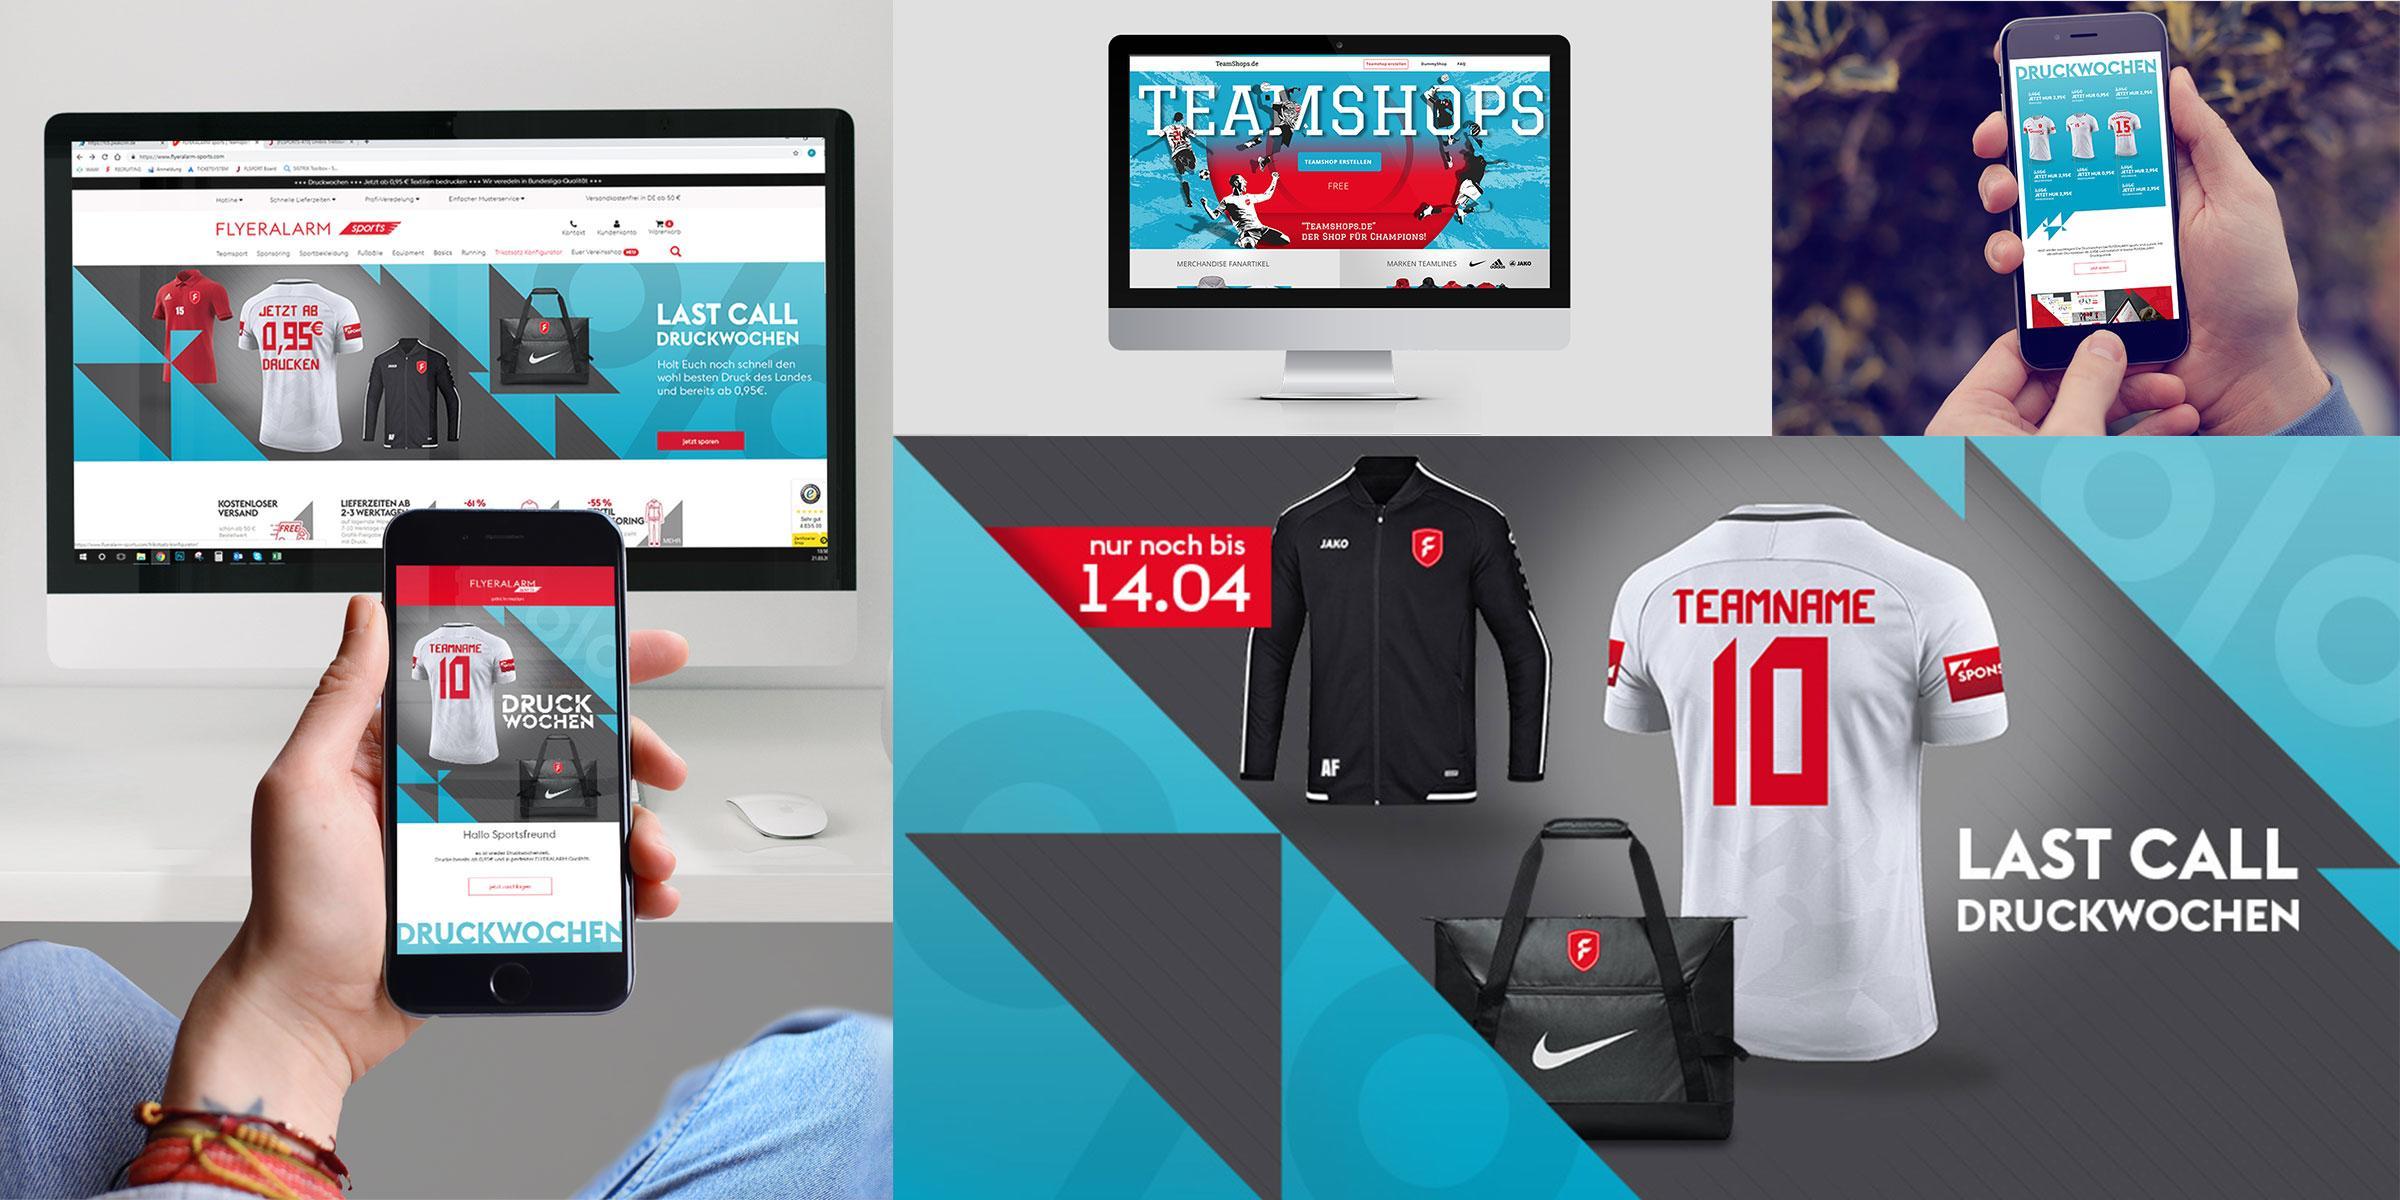 15 gfd gregor fenger designworks for fa sports de branding corporate design smm sma social media marketing online